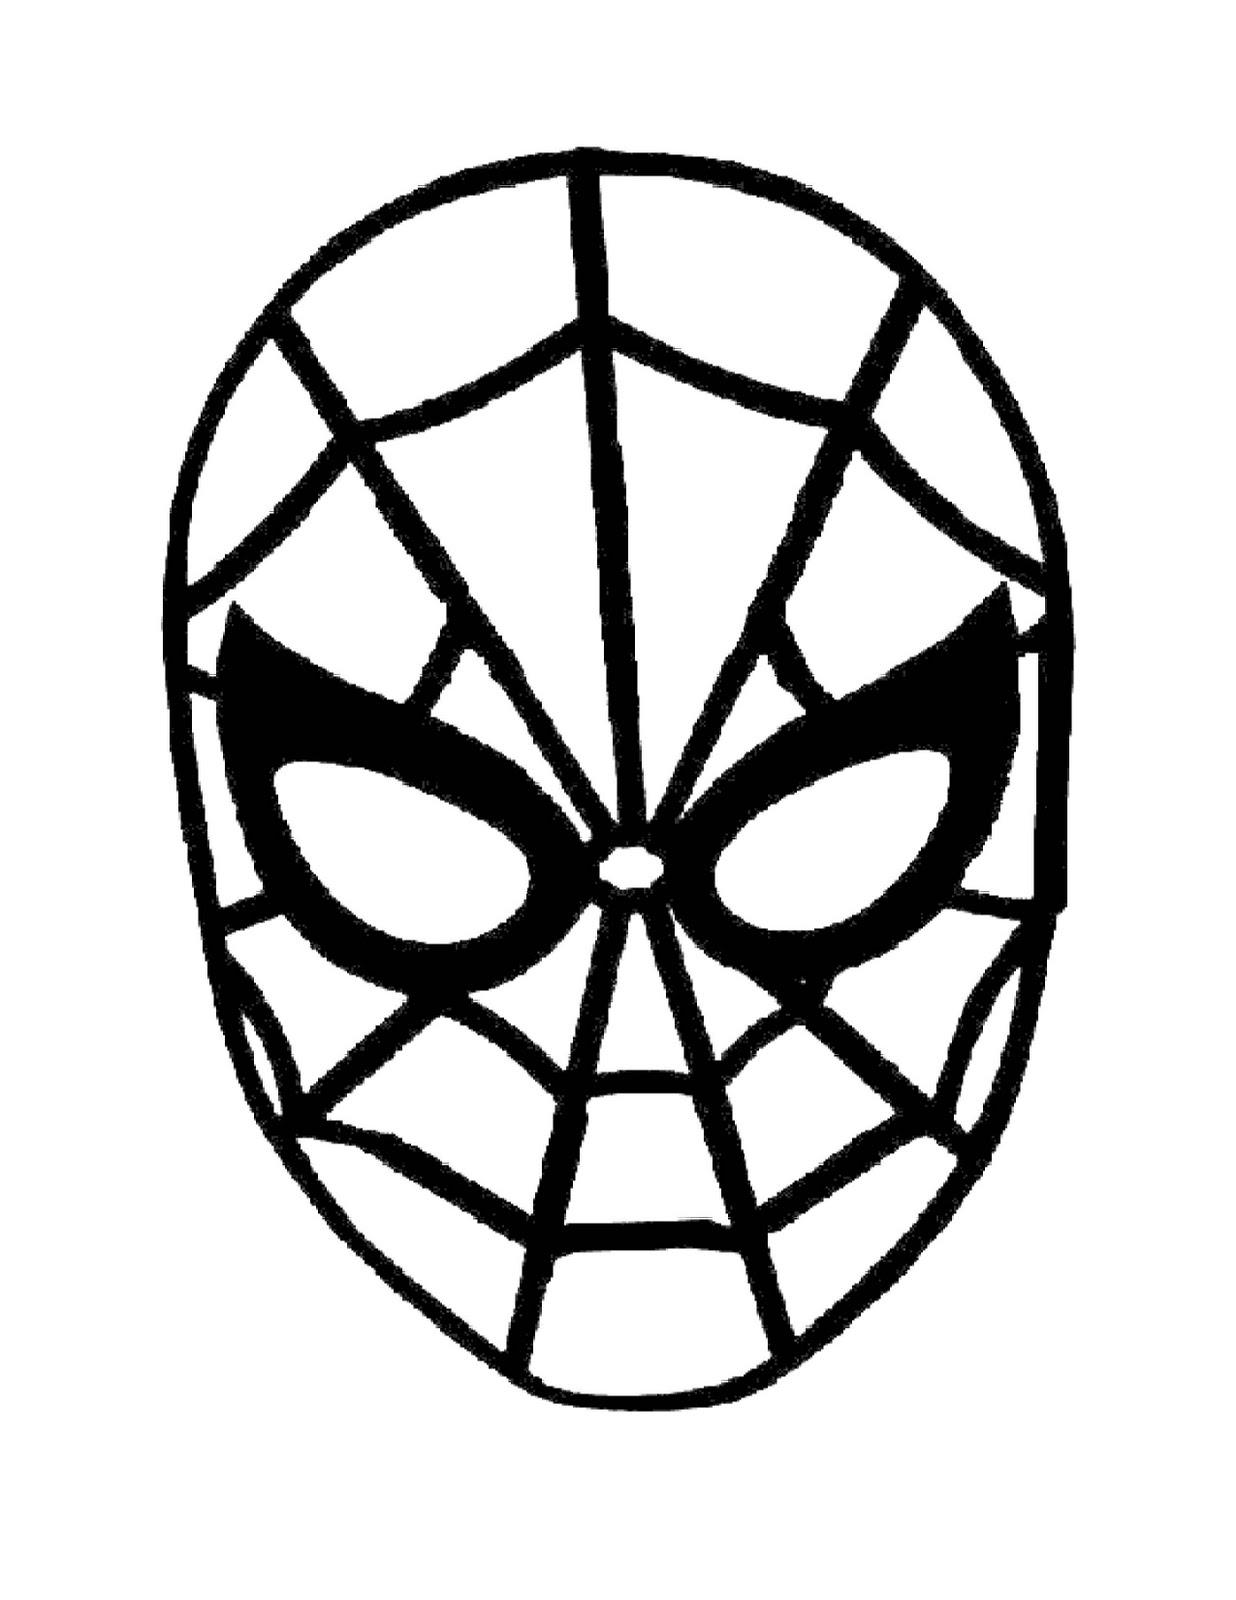 Dibujos para colorear spiderman negro - Imagui